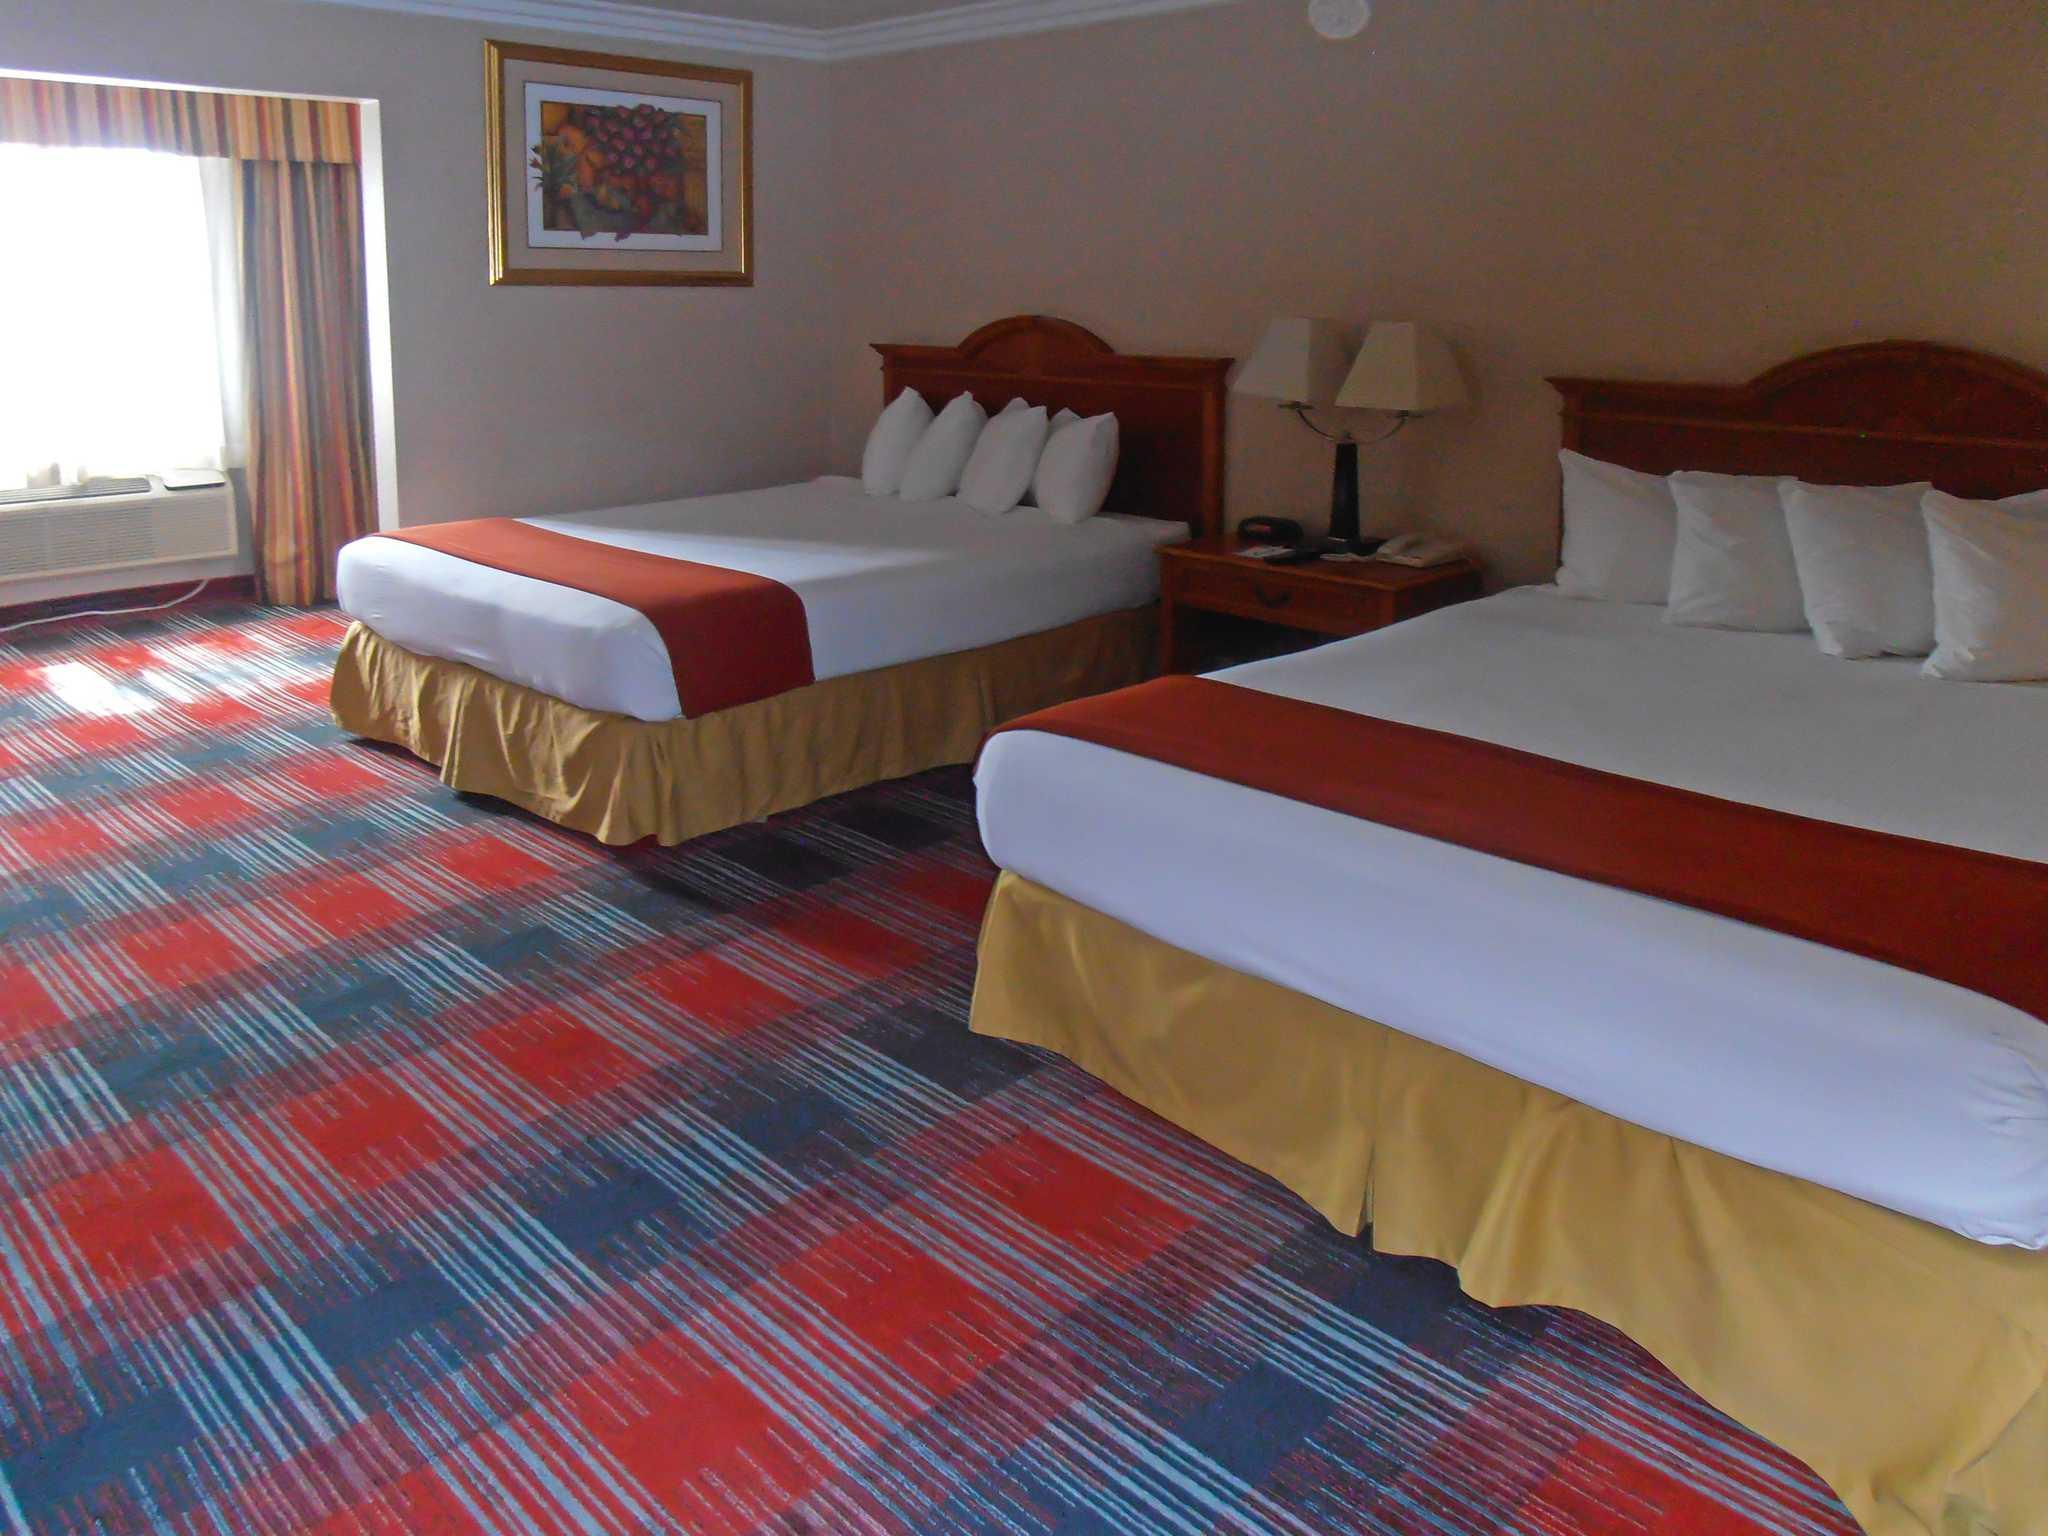 Quality Inn & Suites Oceanside Near Camp Pendleton image 7